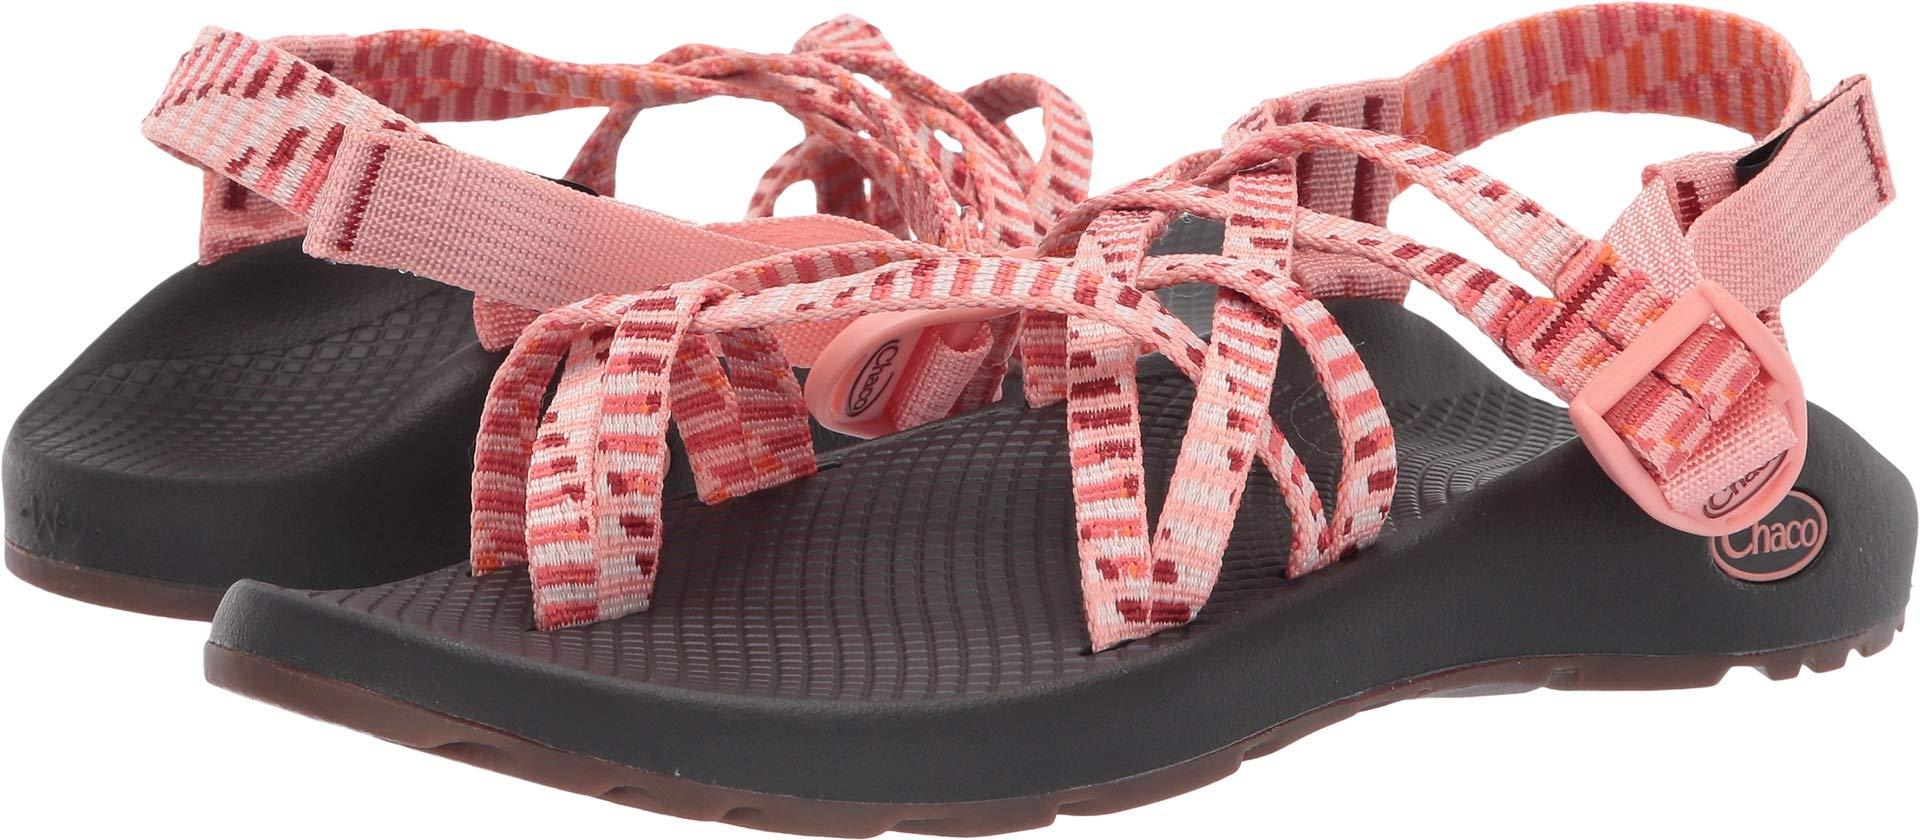 Chaco ZX/2 Classic Sandal - Women's Cerca Peach 5